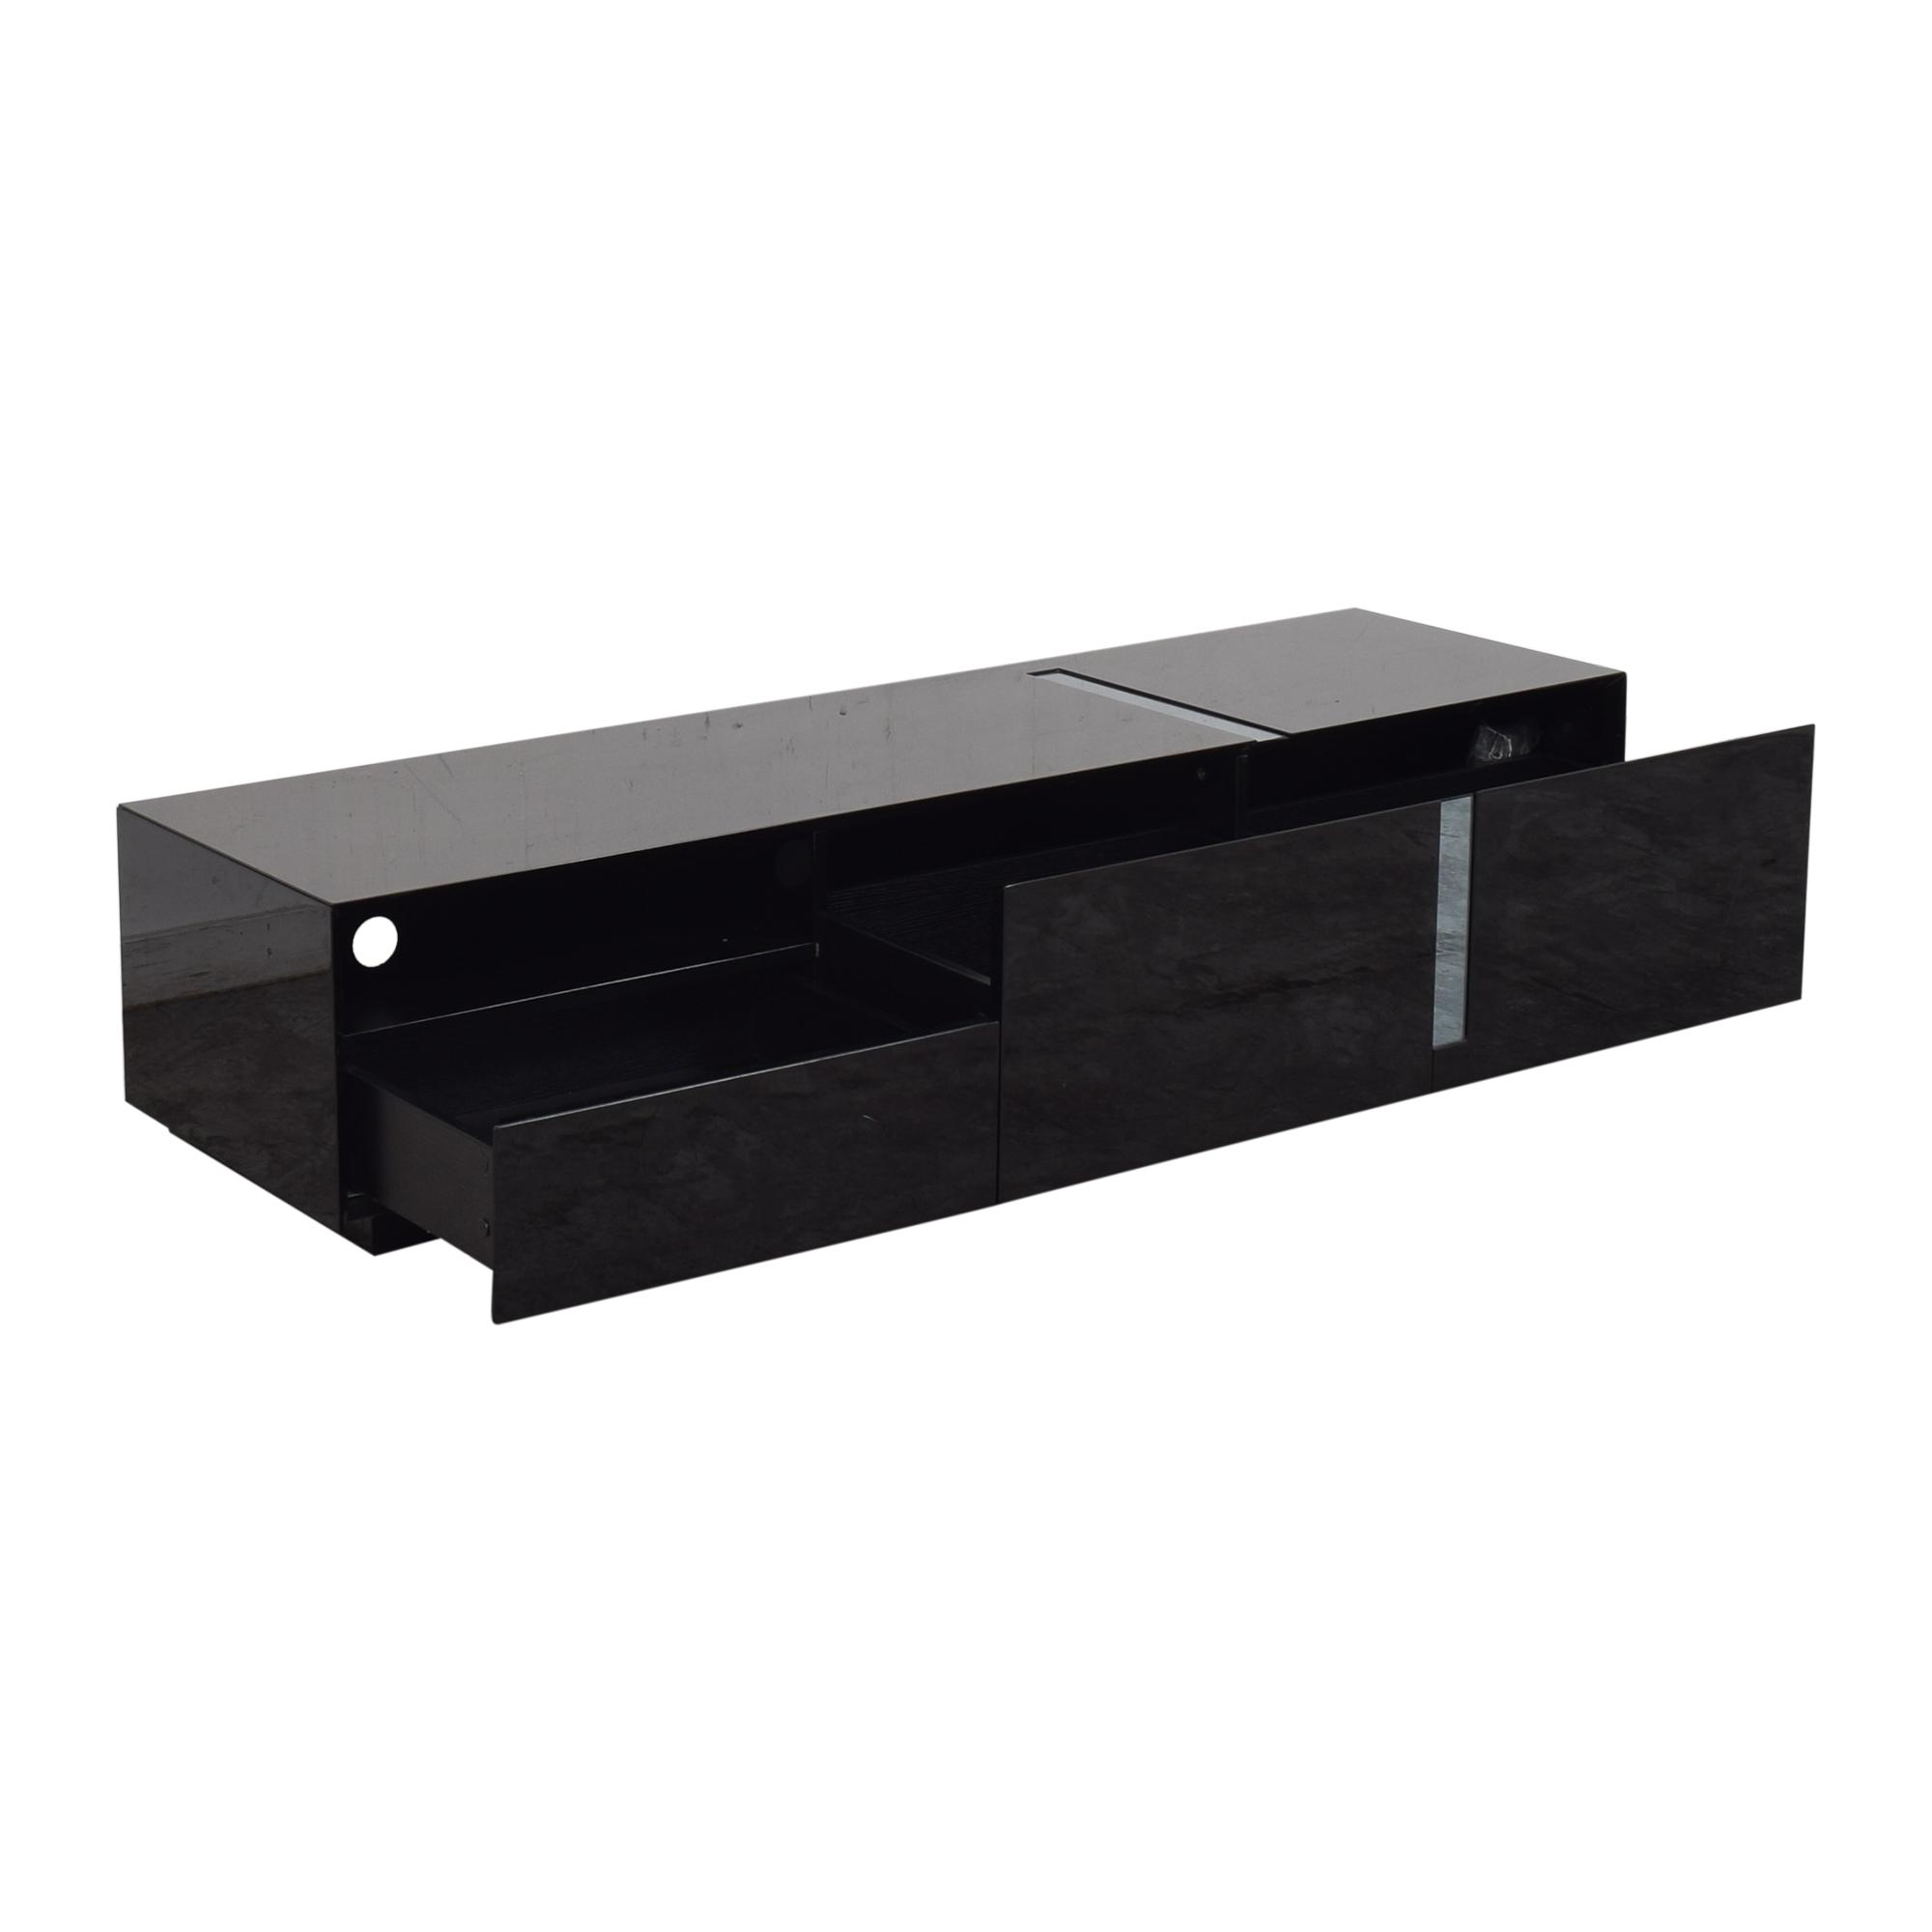 J&M Furniture J&M Furniture Modern TV Stand pa